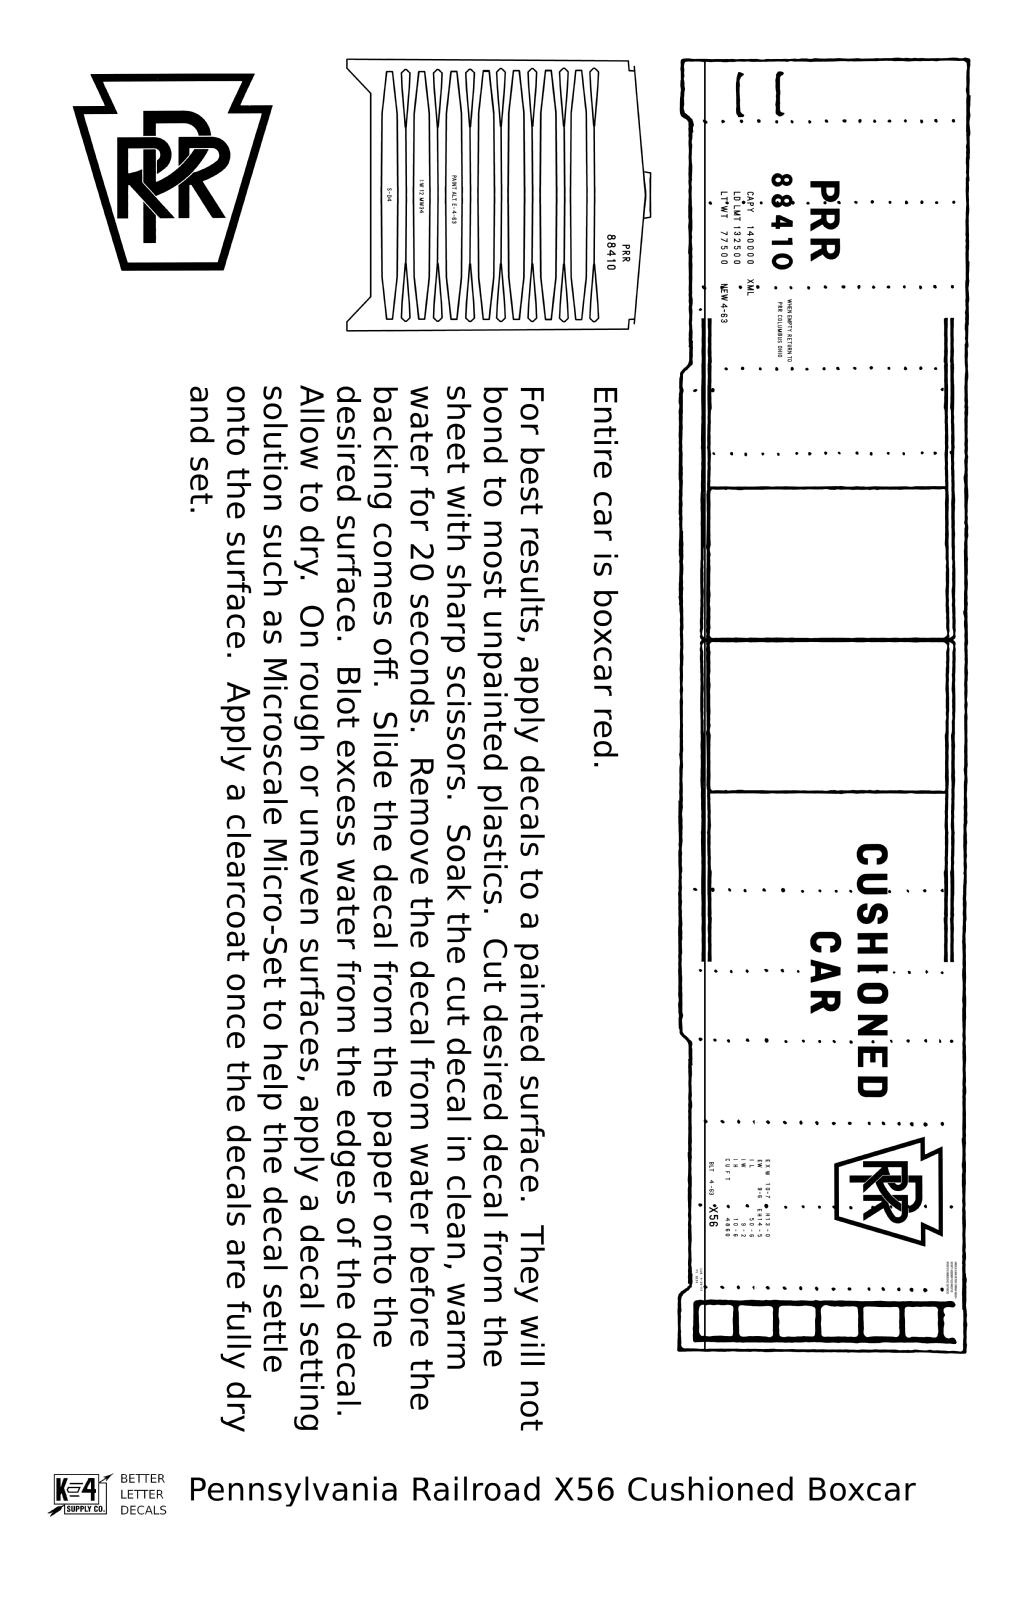 K4 HO Decals Pennsylvania PRR X56 50 Ft Double Door Boxcar Cushioned Car